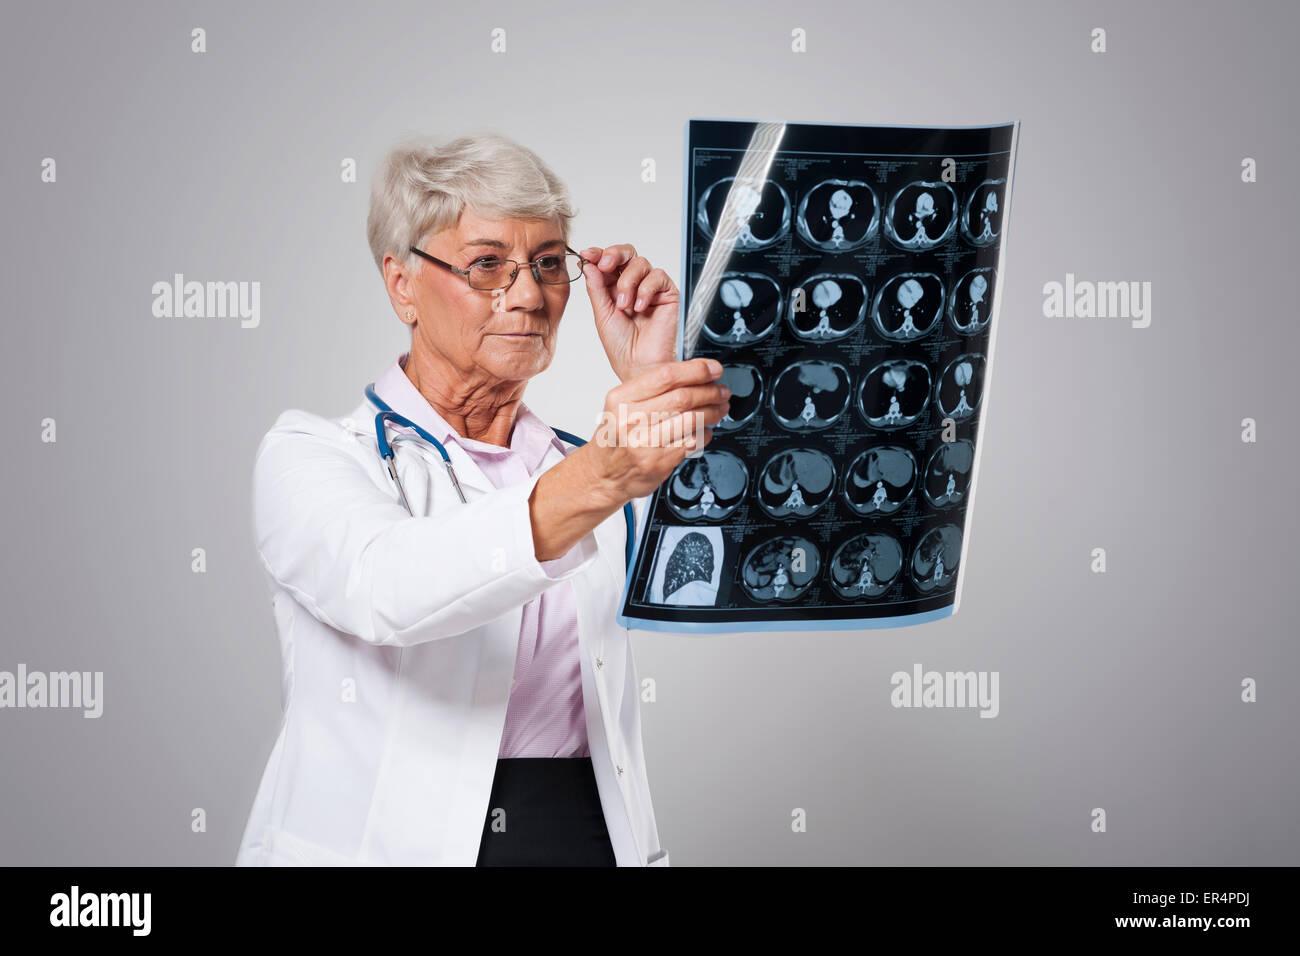 Senior female doctor analyzing x-ray image. Debica, Poland - Stock Image